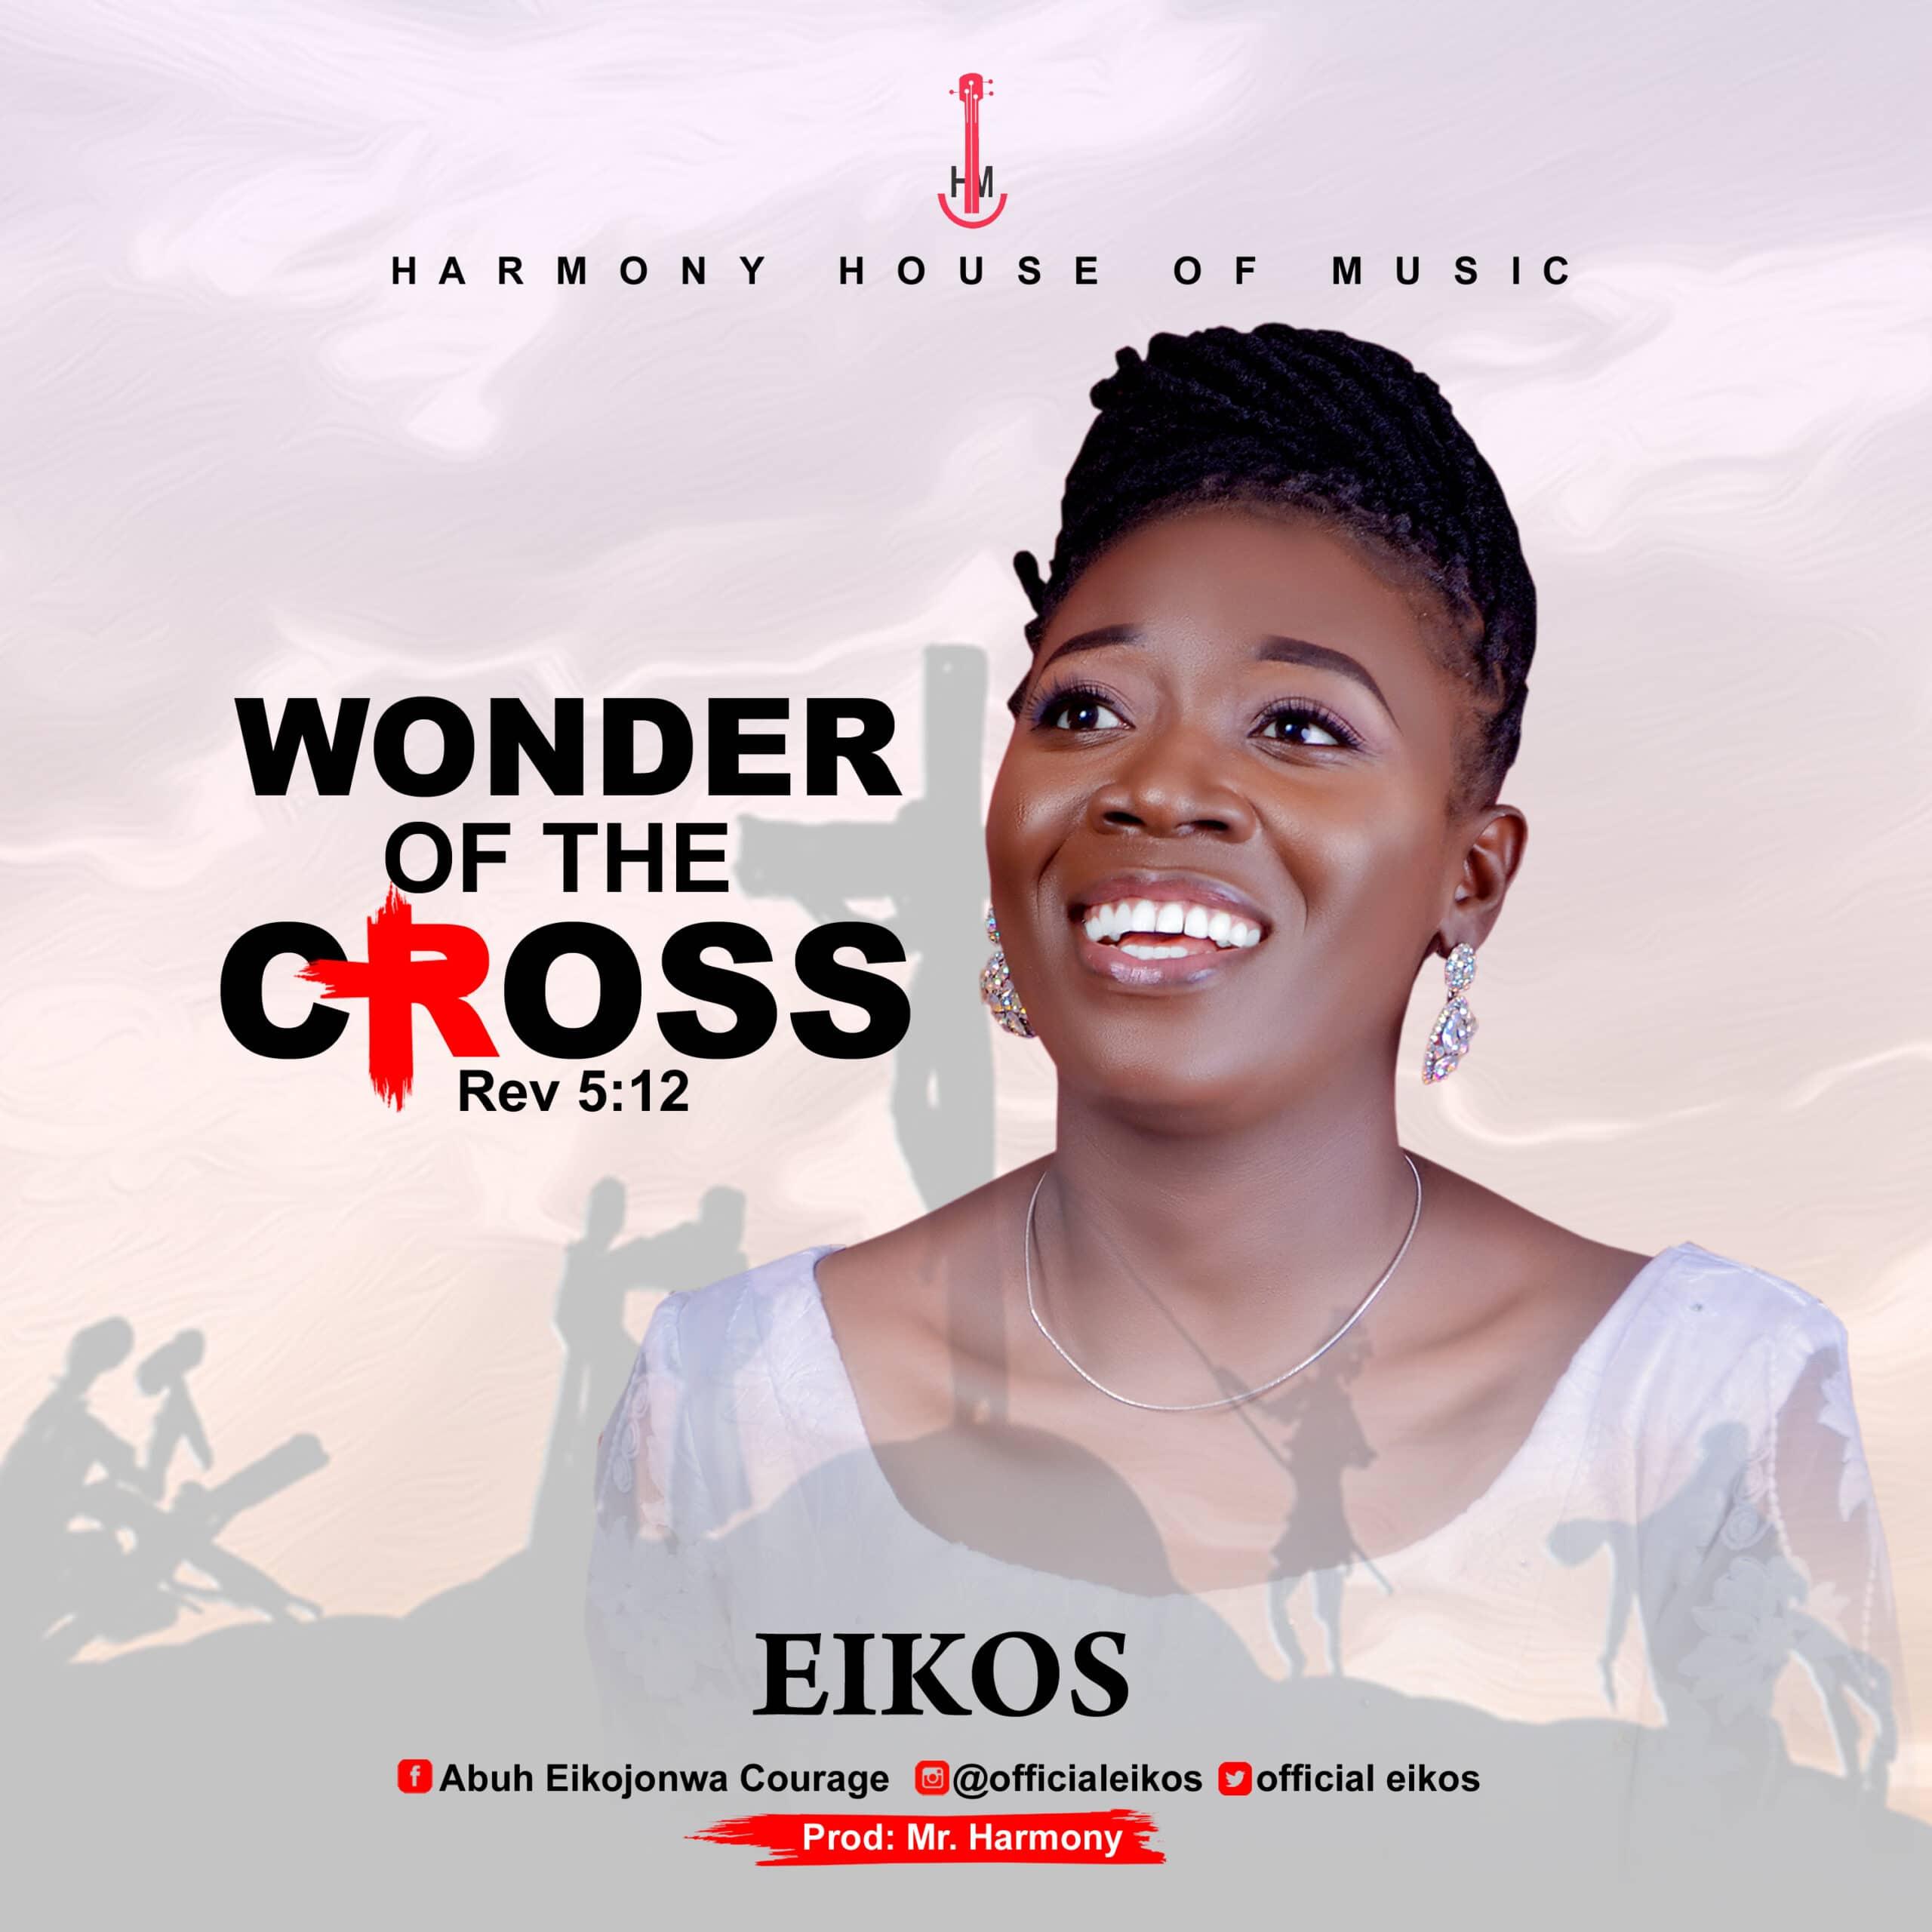 Wonder of the cross eikos